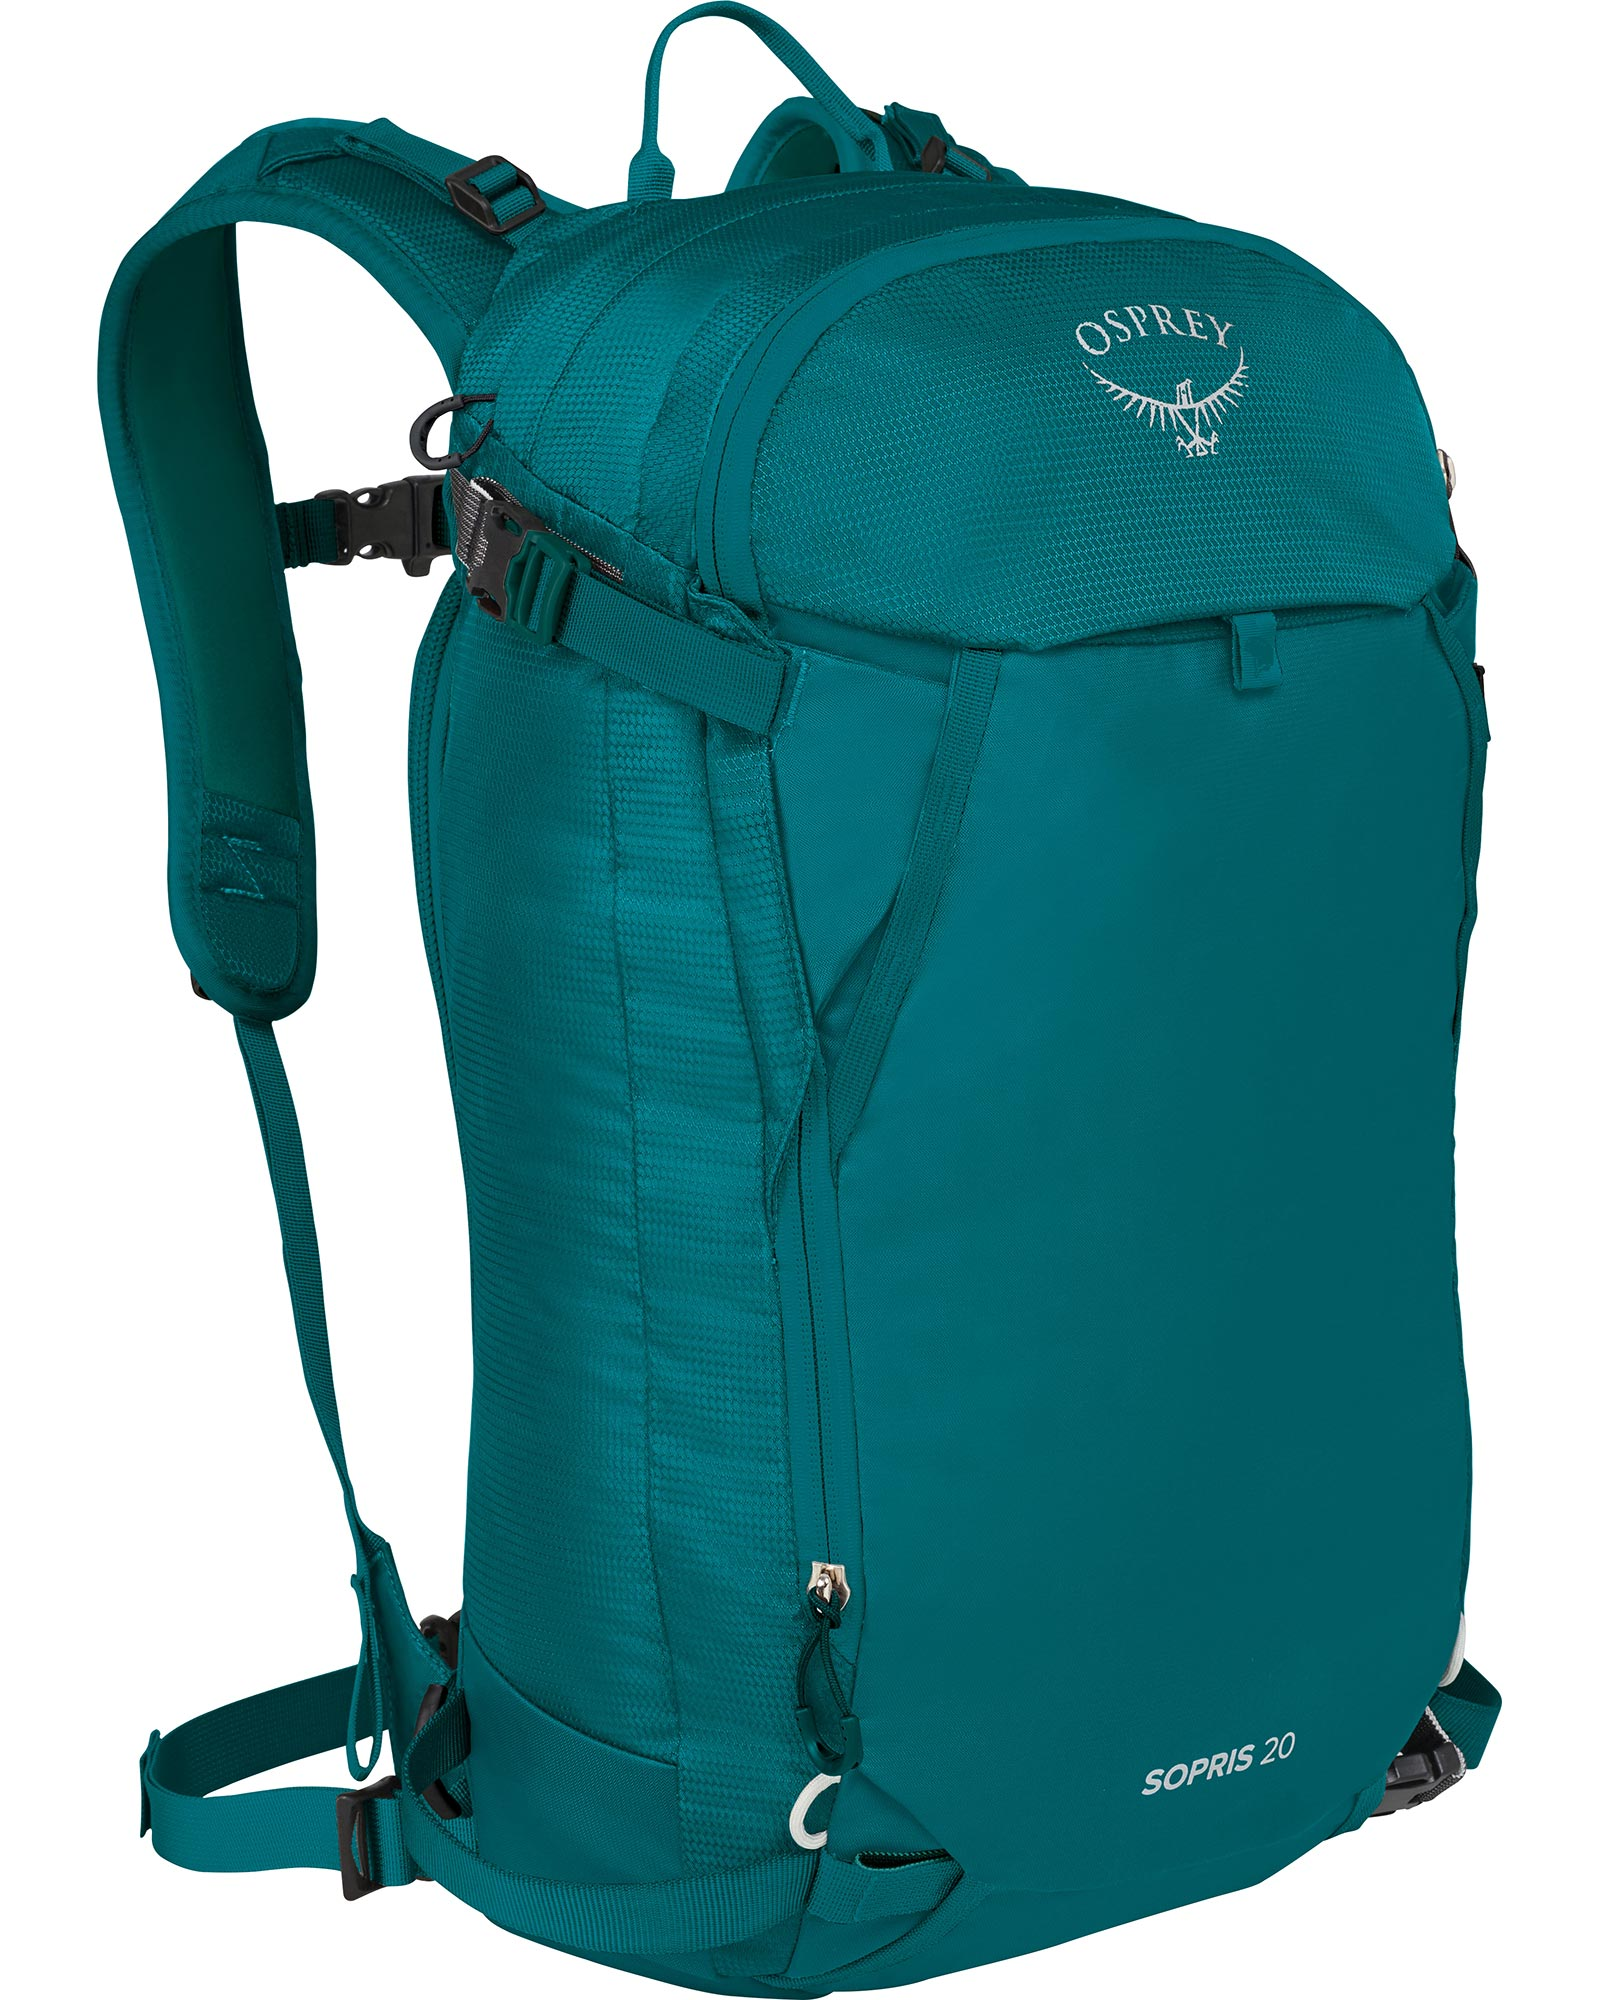 Osprey Sopris 20 Women's Backpack 0